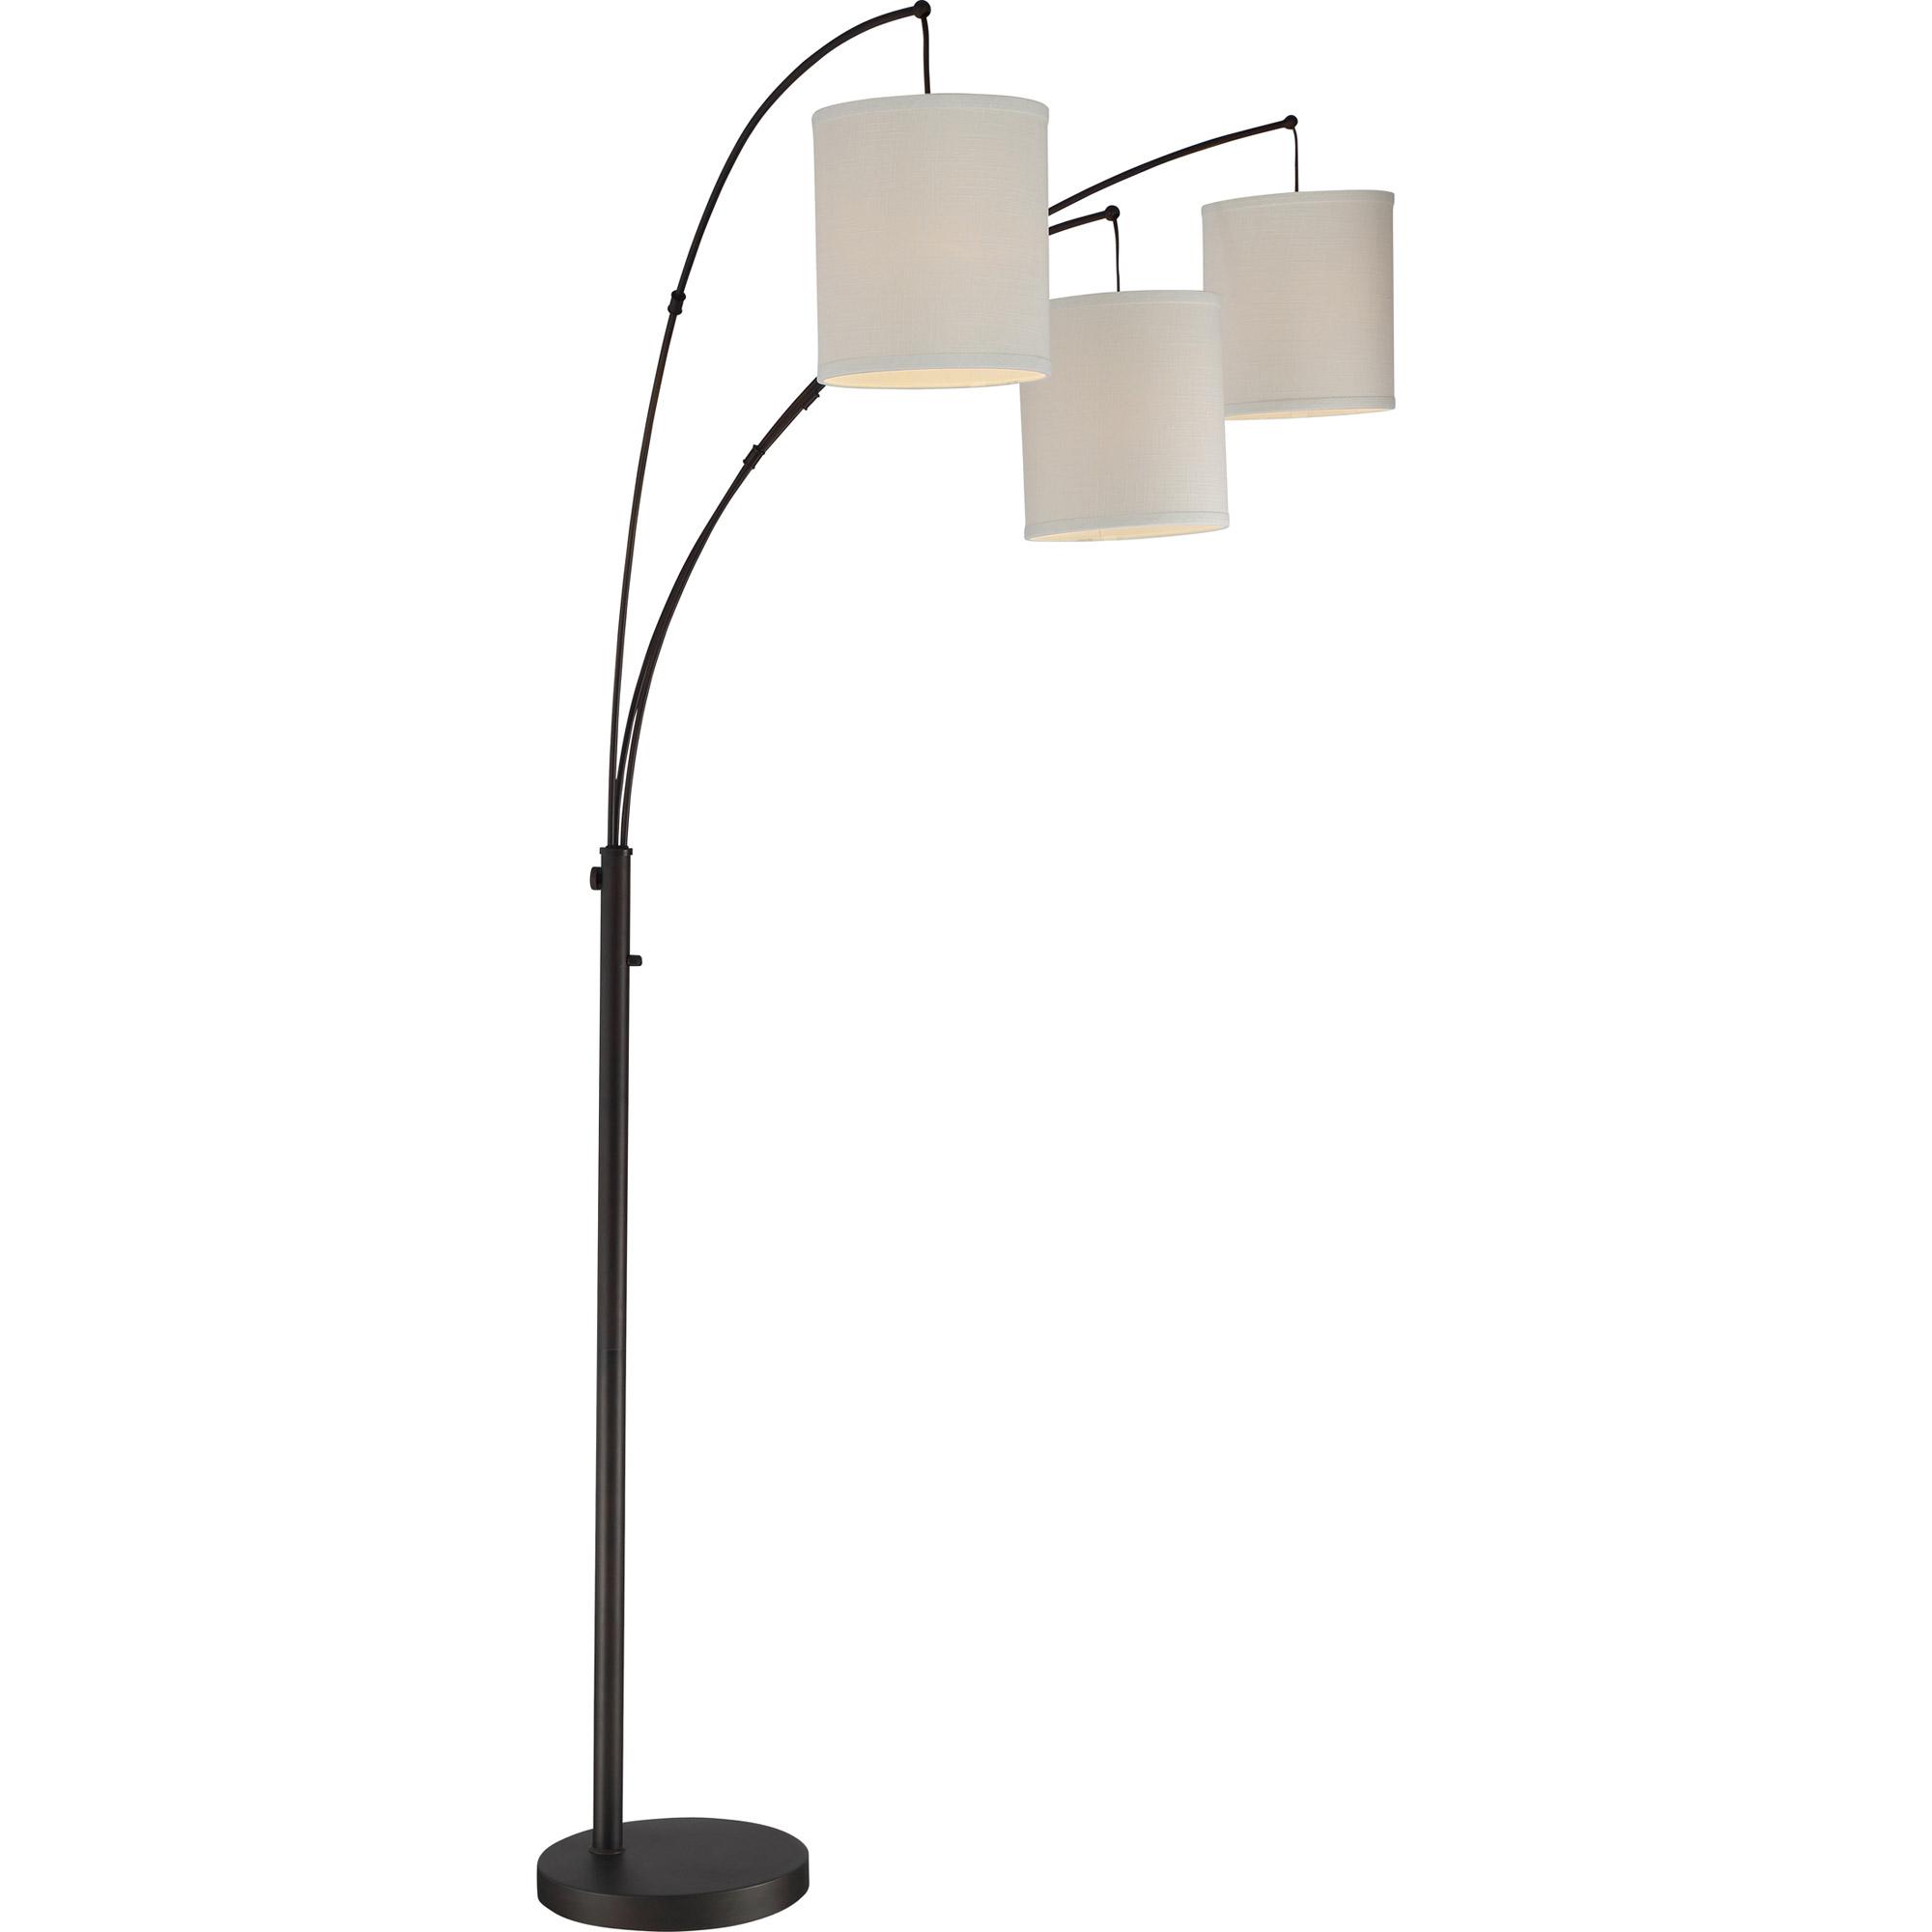 Overlook Floor Lamp By Quoizel Q2605foi